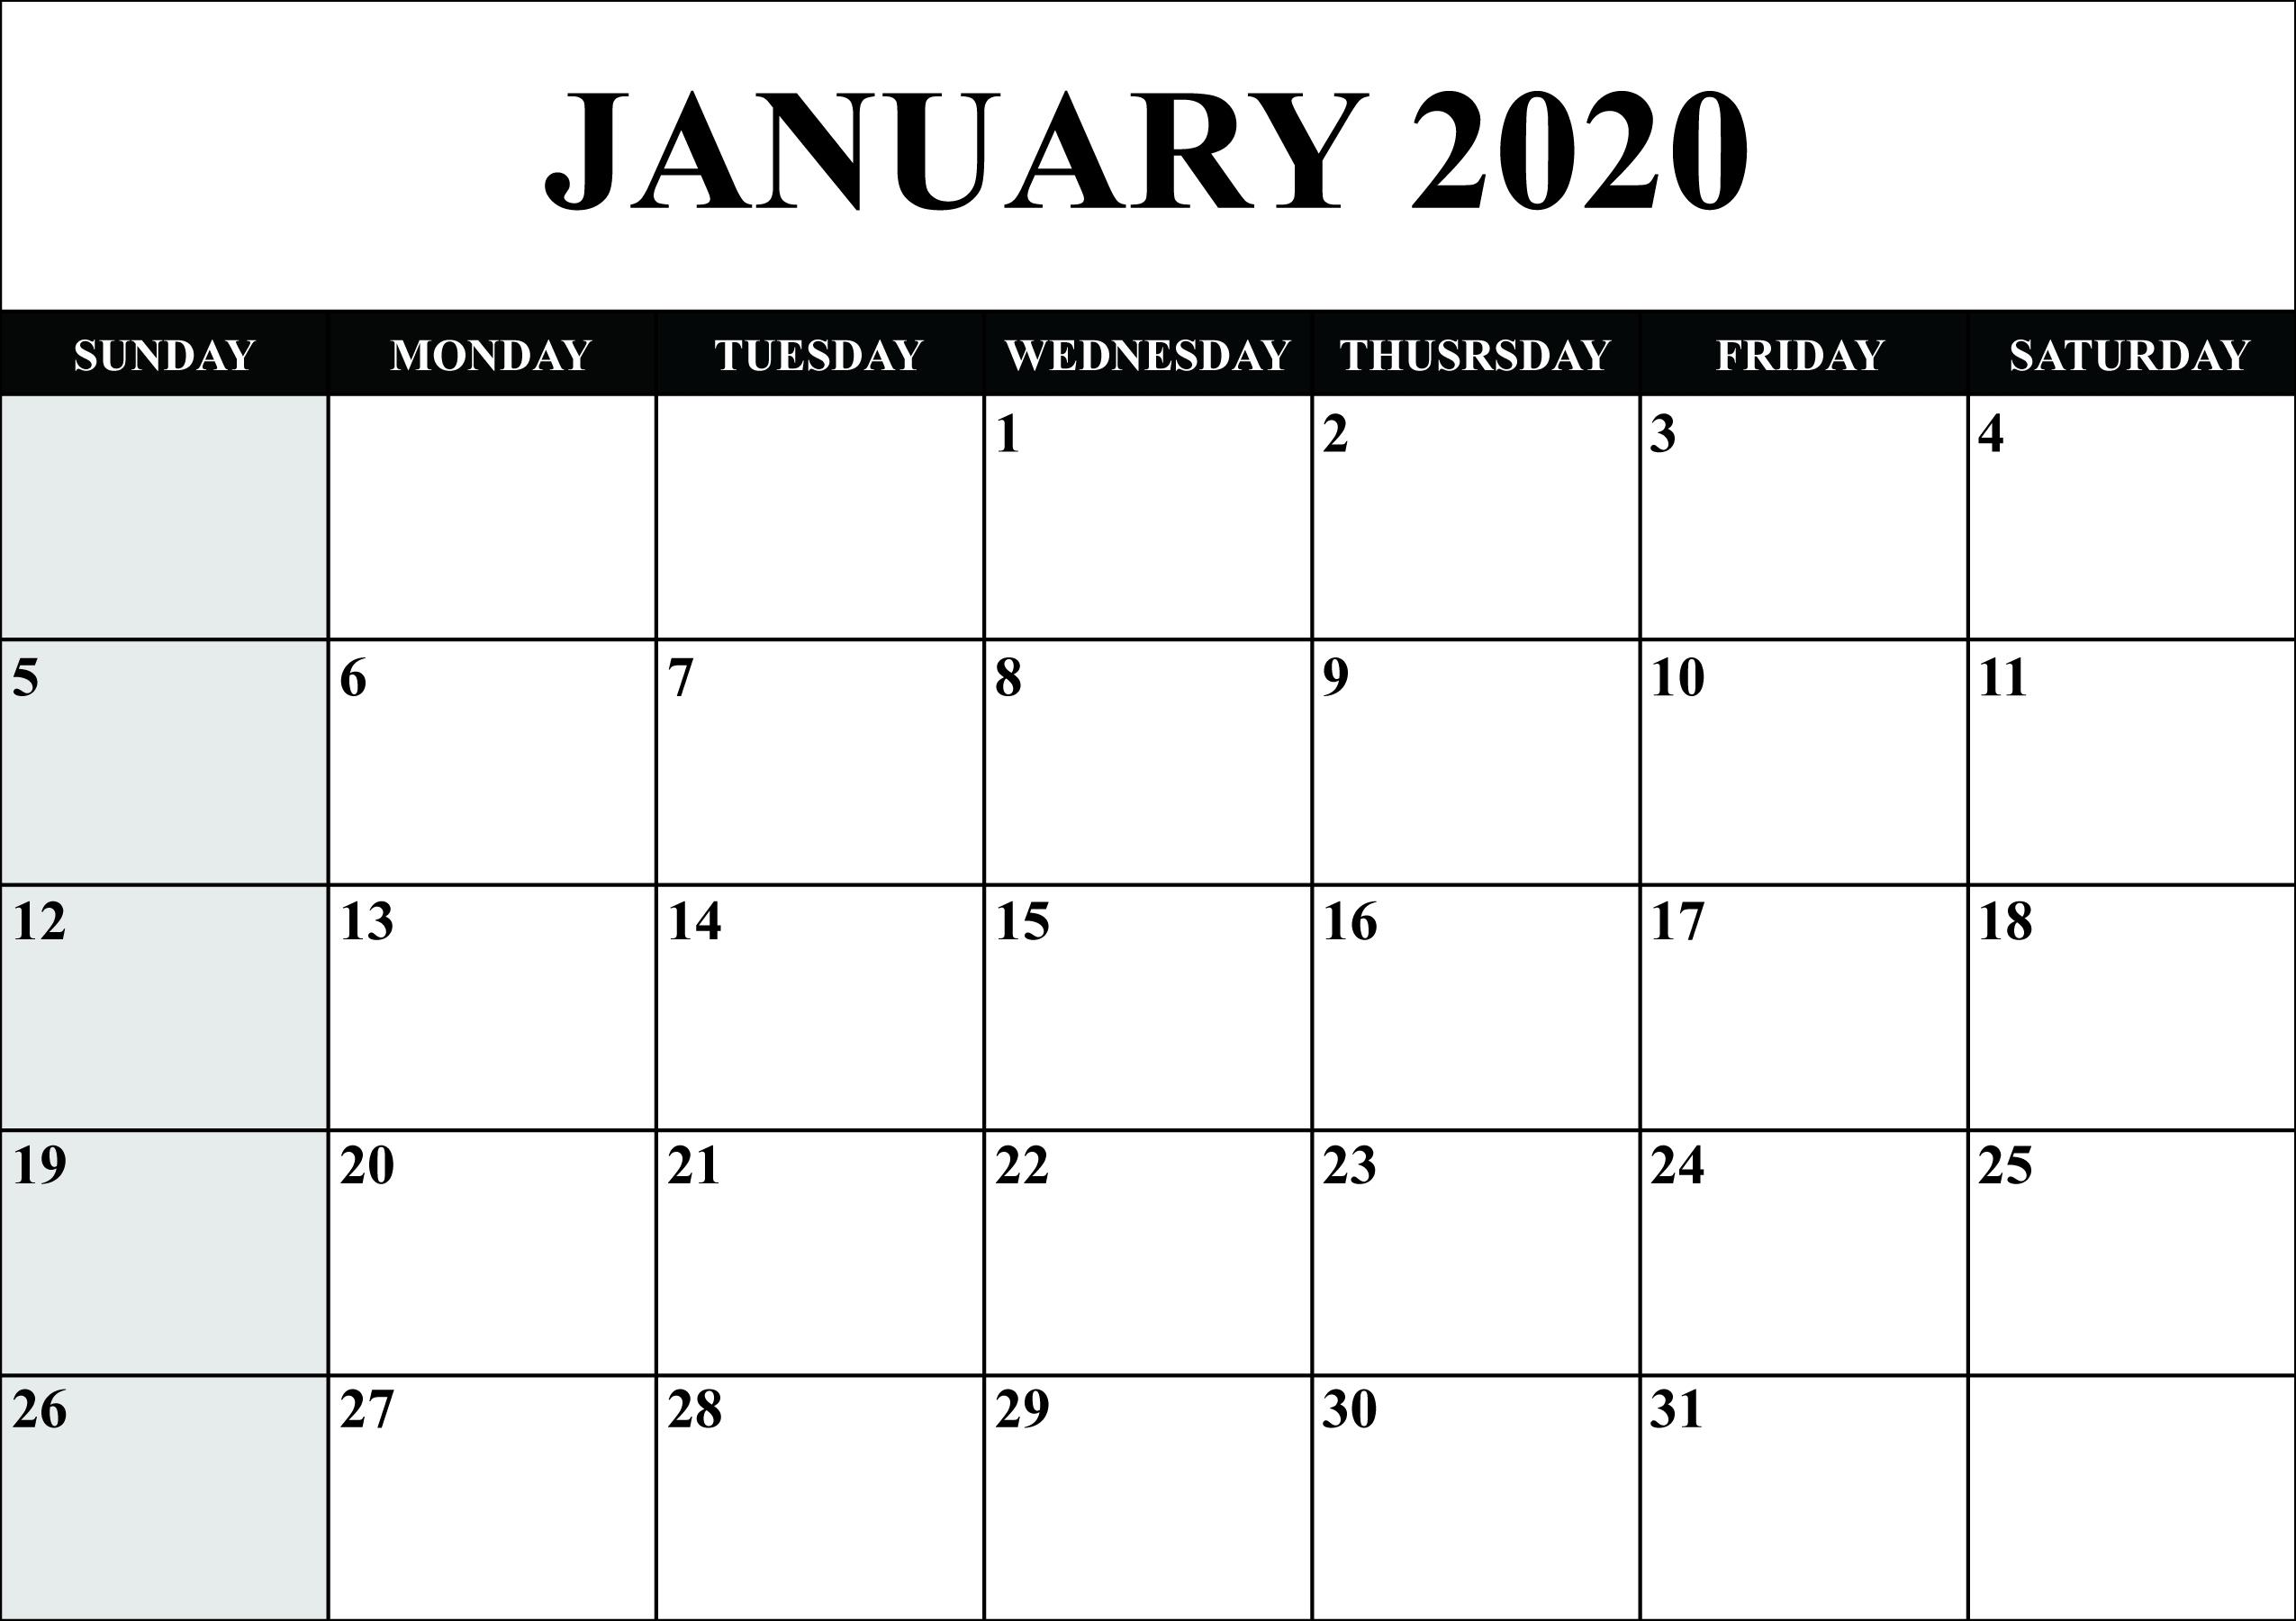 January Calendar 2020 Word - Free August 2019 Calendar